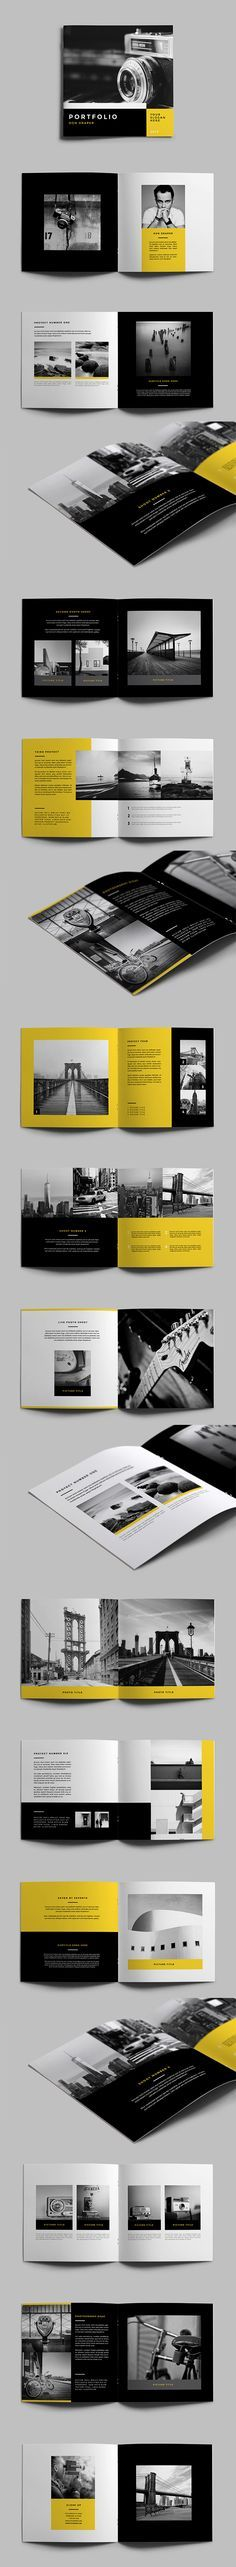 Simple Minimal Portfolio. Download here: http://graphicriver.net/item/simple-minimal-portfolio/11455547?ref=abradesign #portfolio #brochure #design